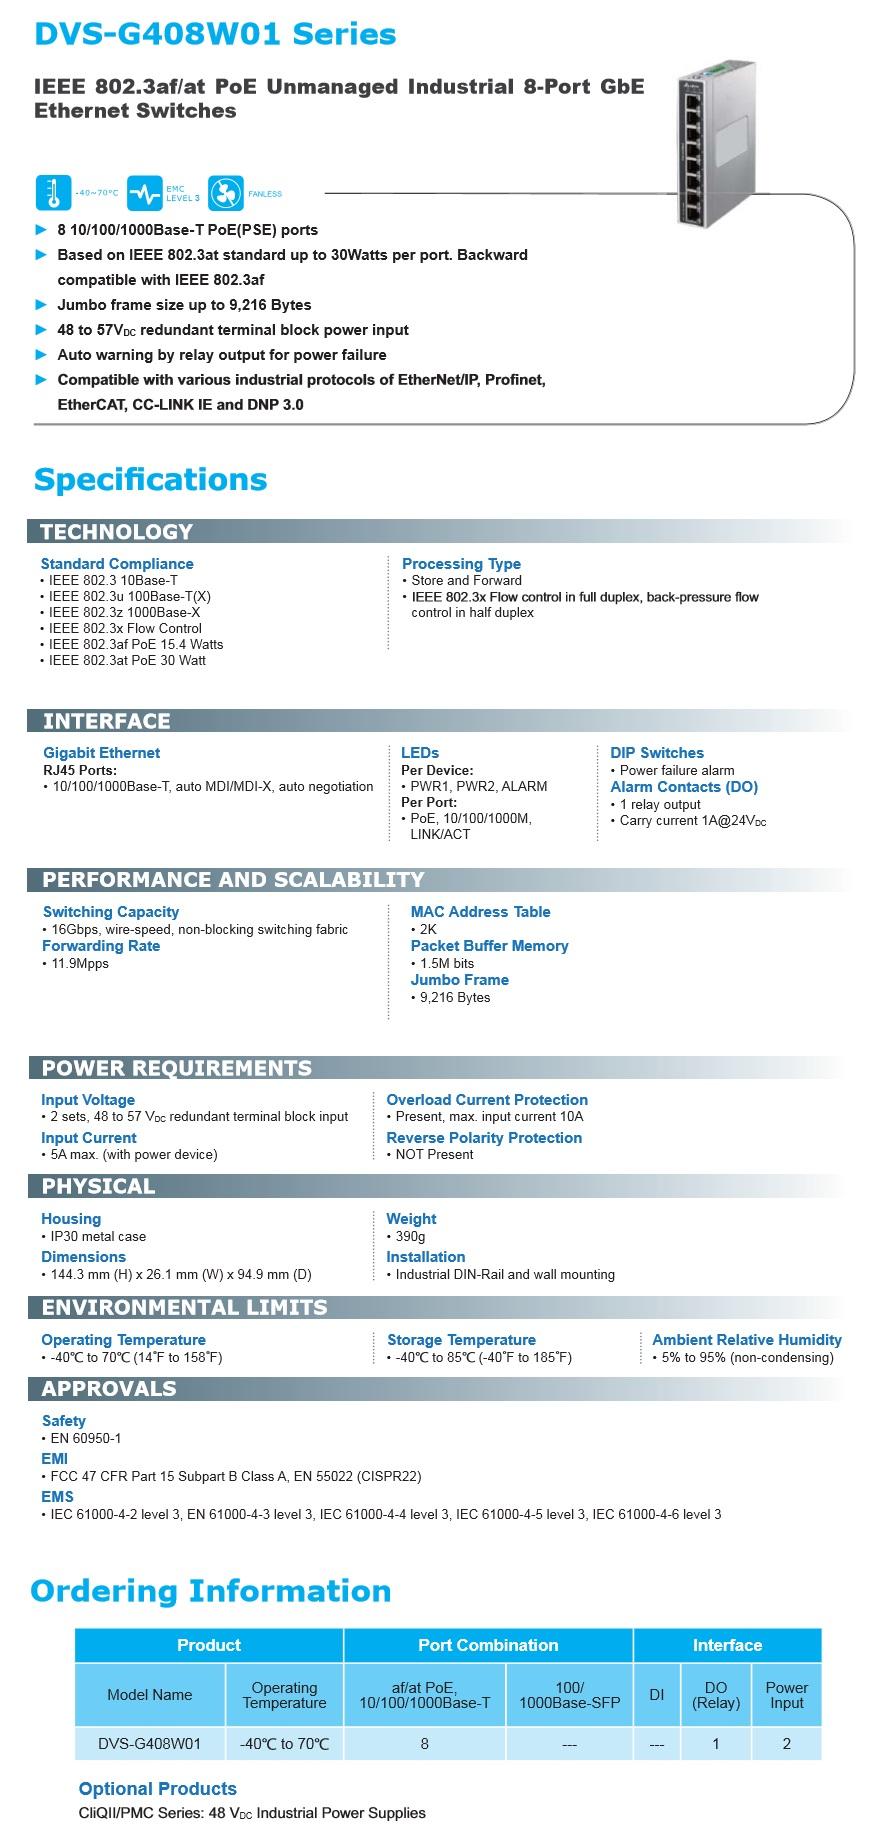 Delta: Industrial Ethernet Solution (DVS-G408W01 Series)